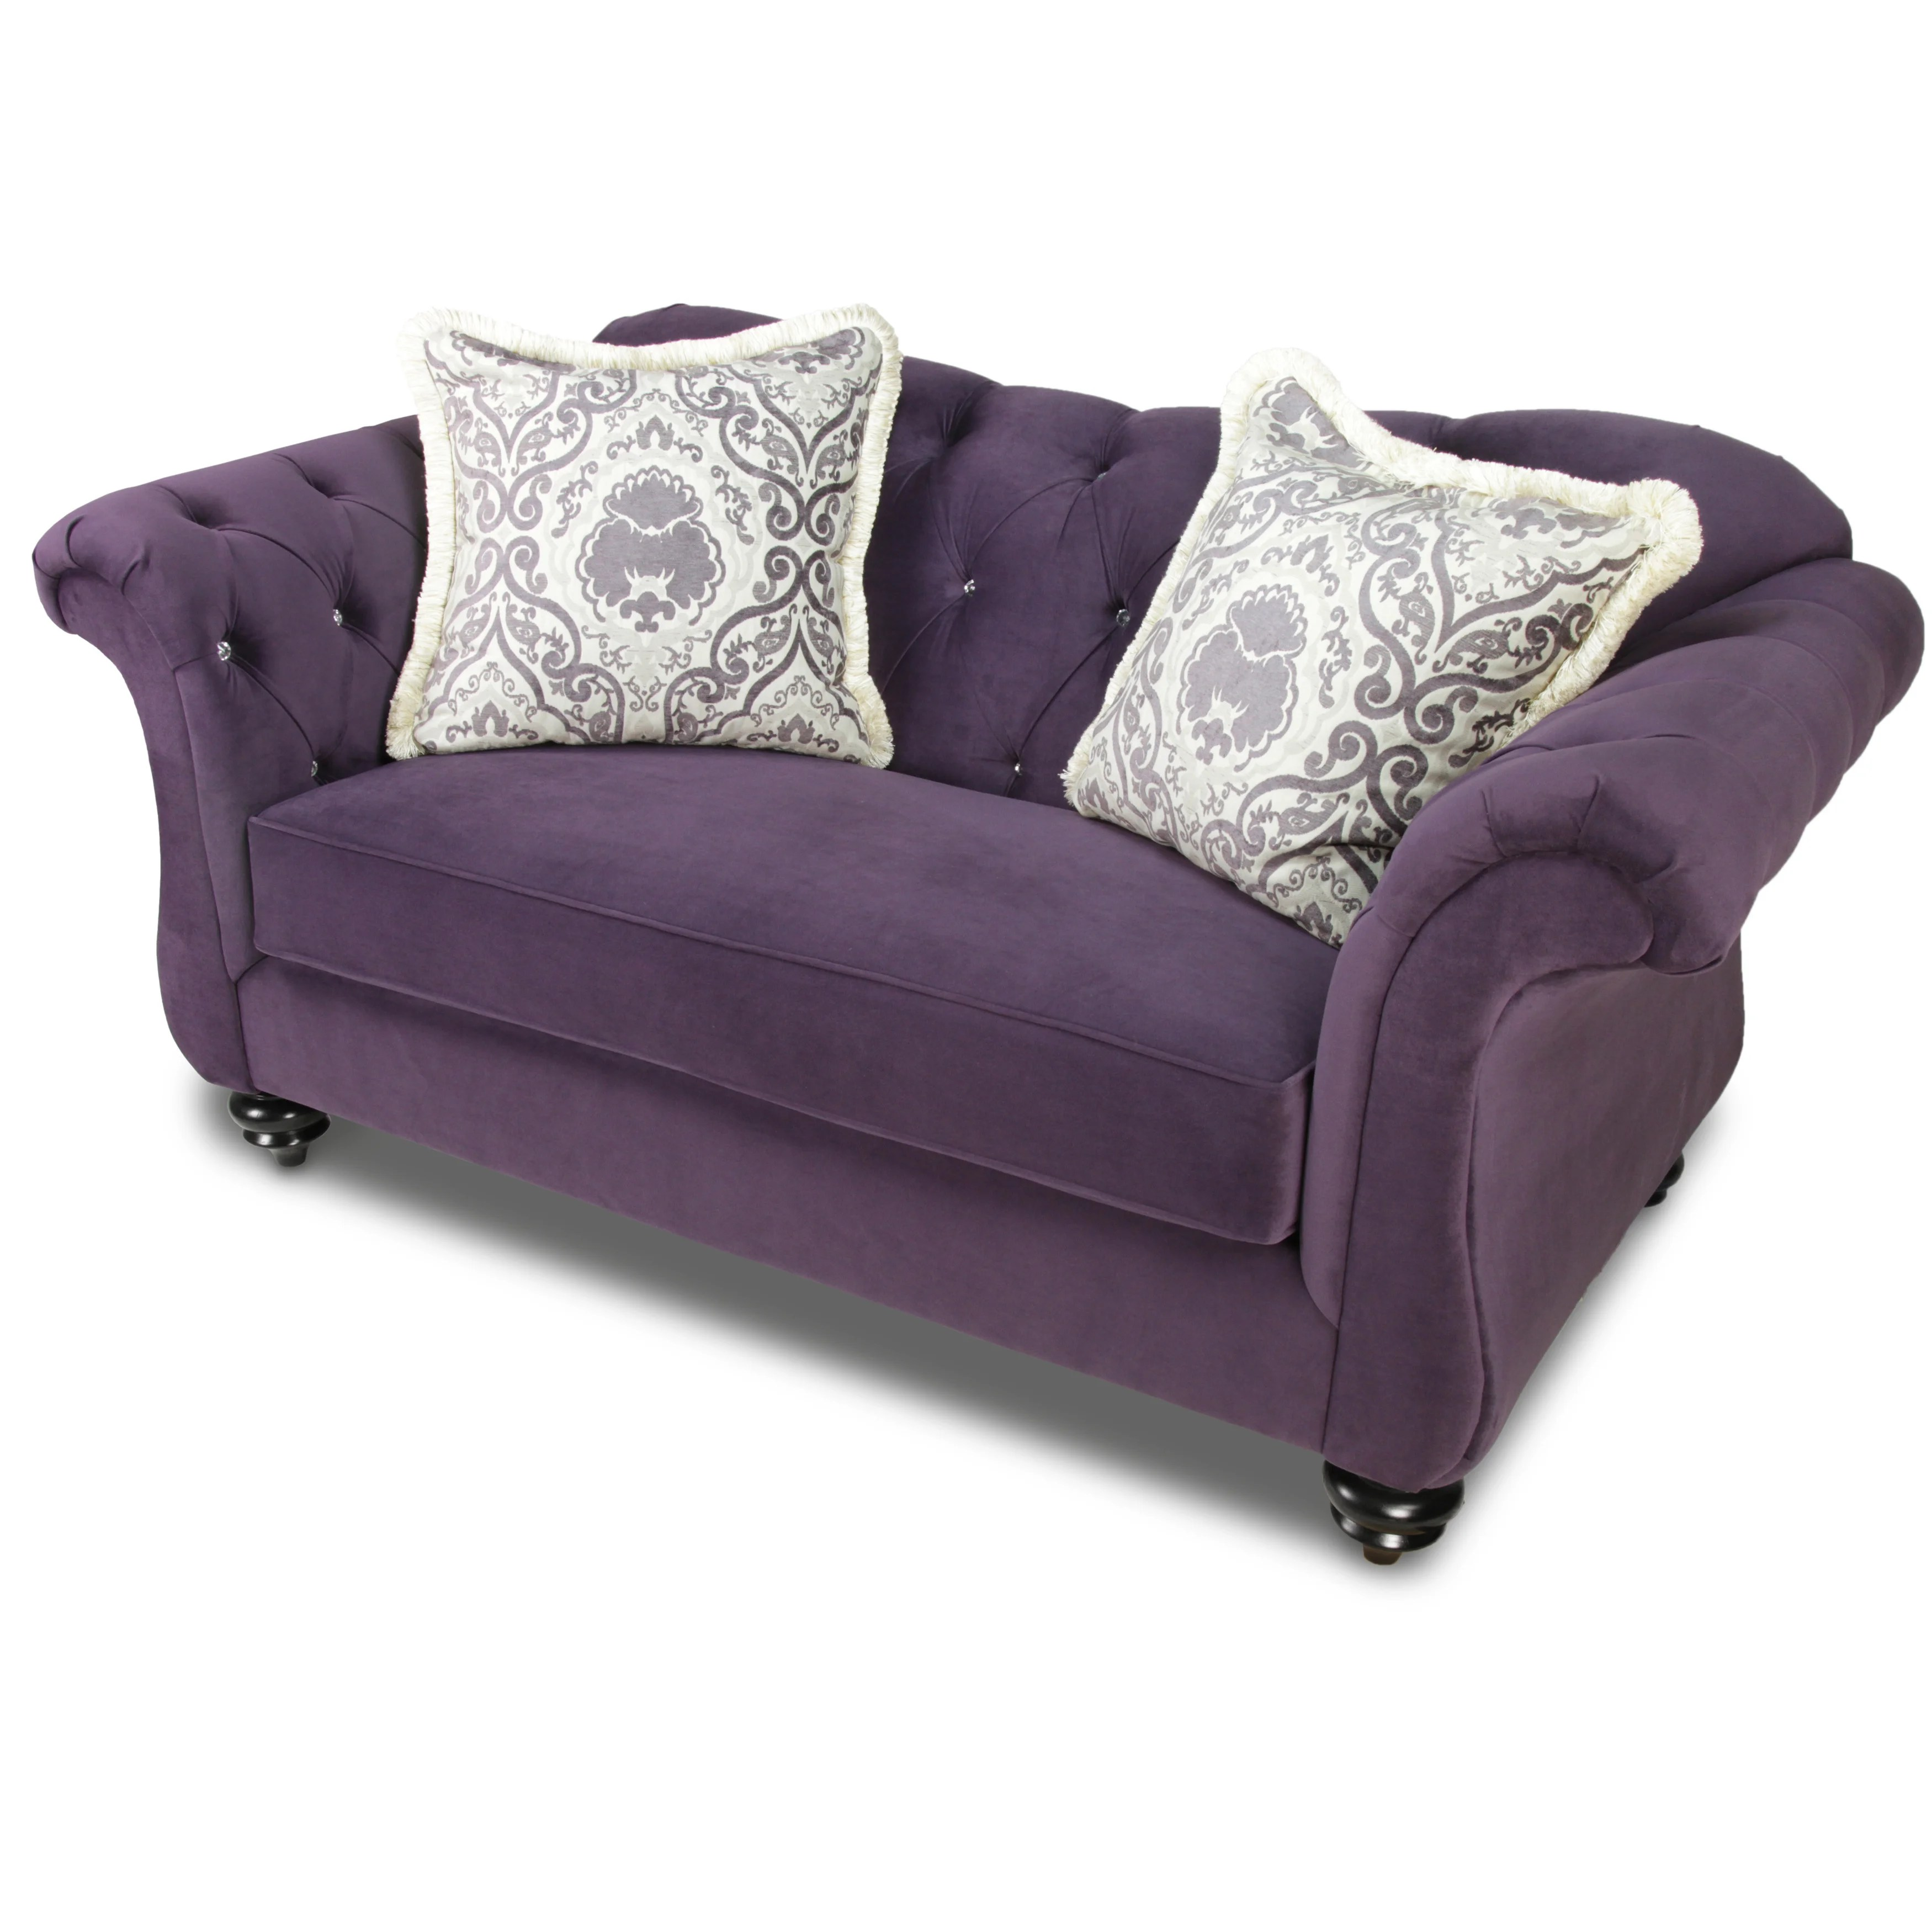 agatha sofa reviews patio cushions furniture of america traditional tufted loveseat